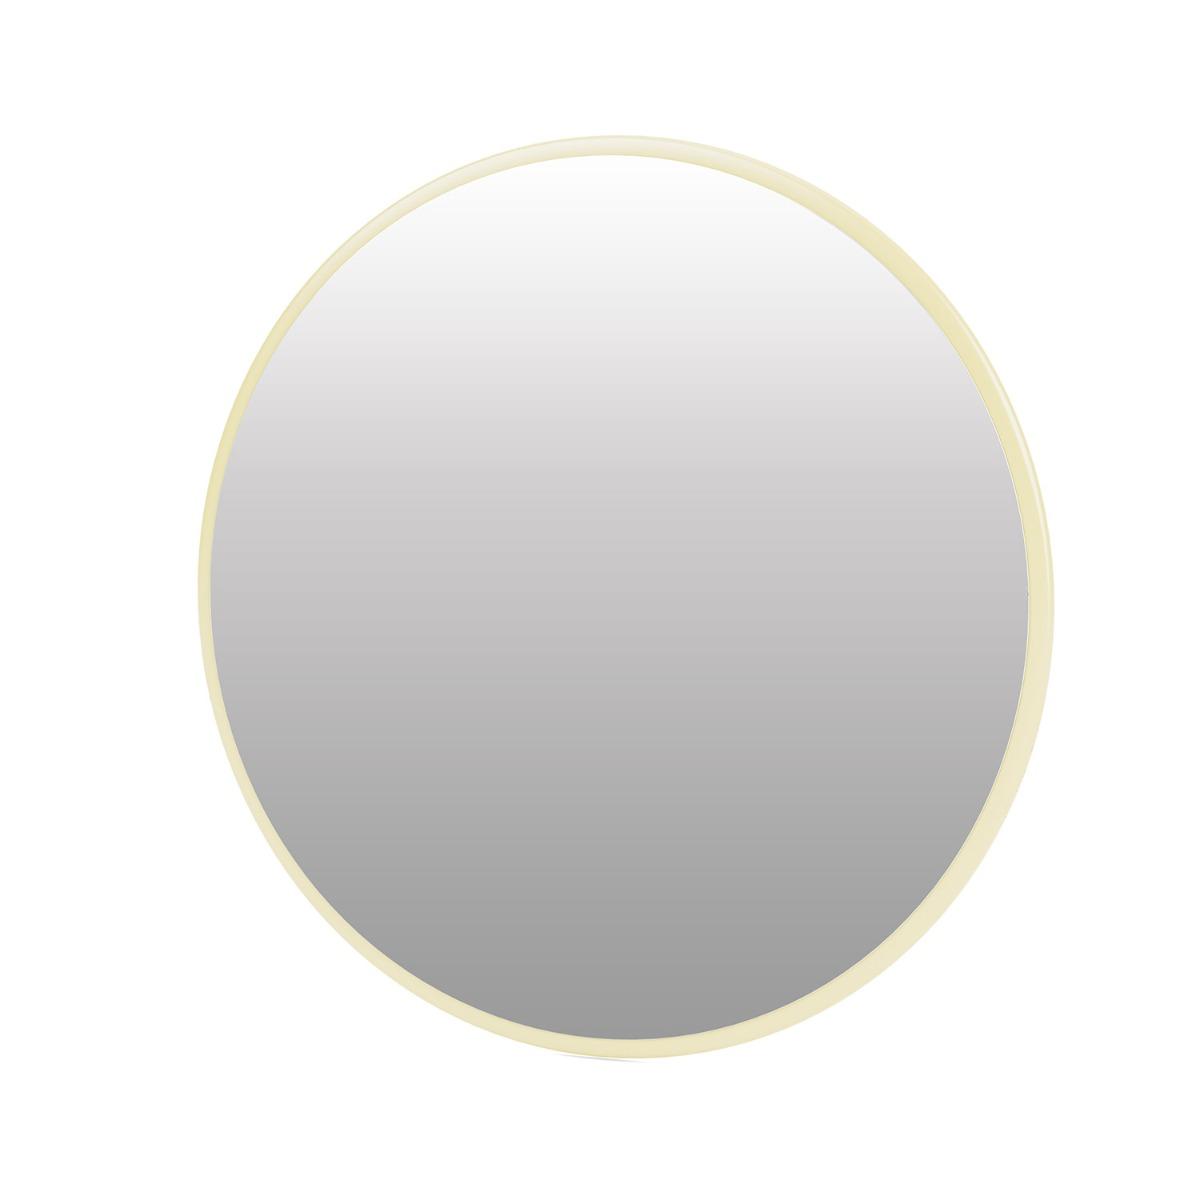 Montana Mini Spegel Rund 35 cm Camomile